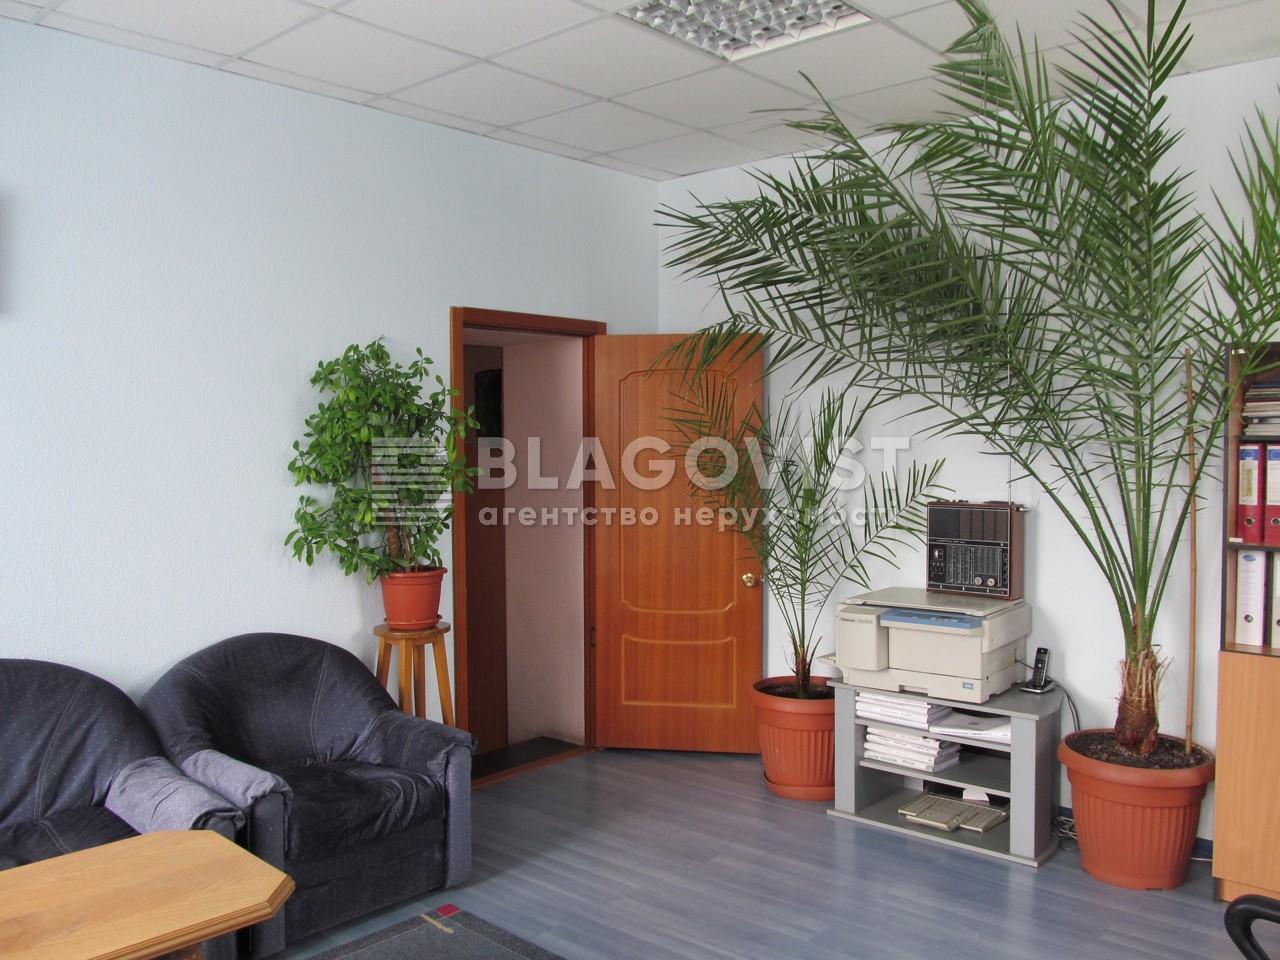 Офисно-складское помещение, F-33728, Скляренко Семена, Киев - Фото 11